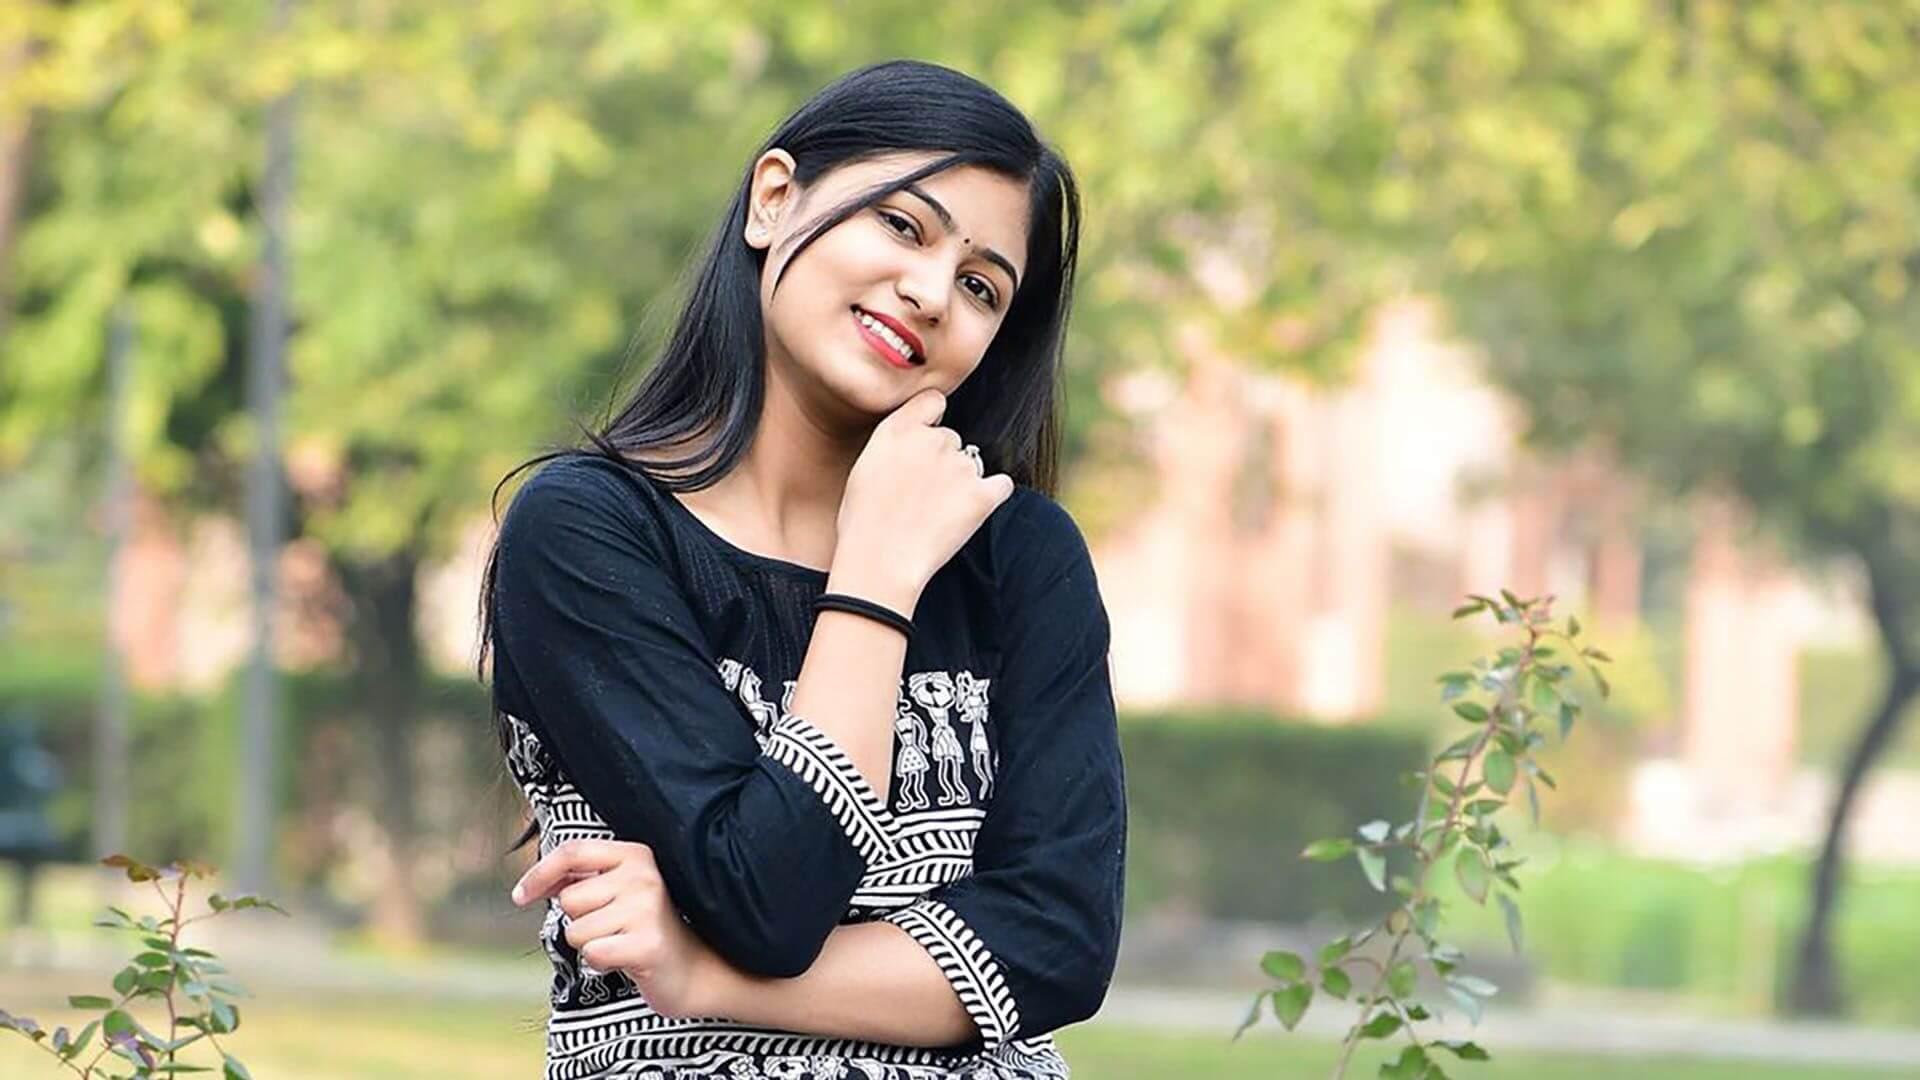 Surbhi Rathore Biography, Age, Boyfriend, Facts and More